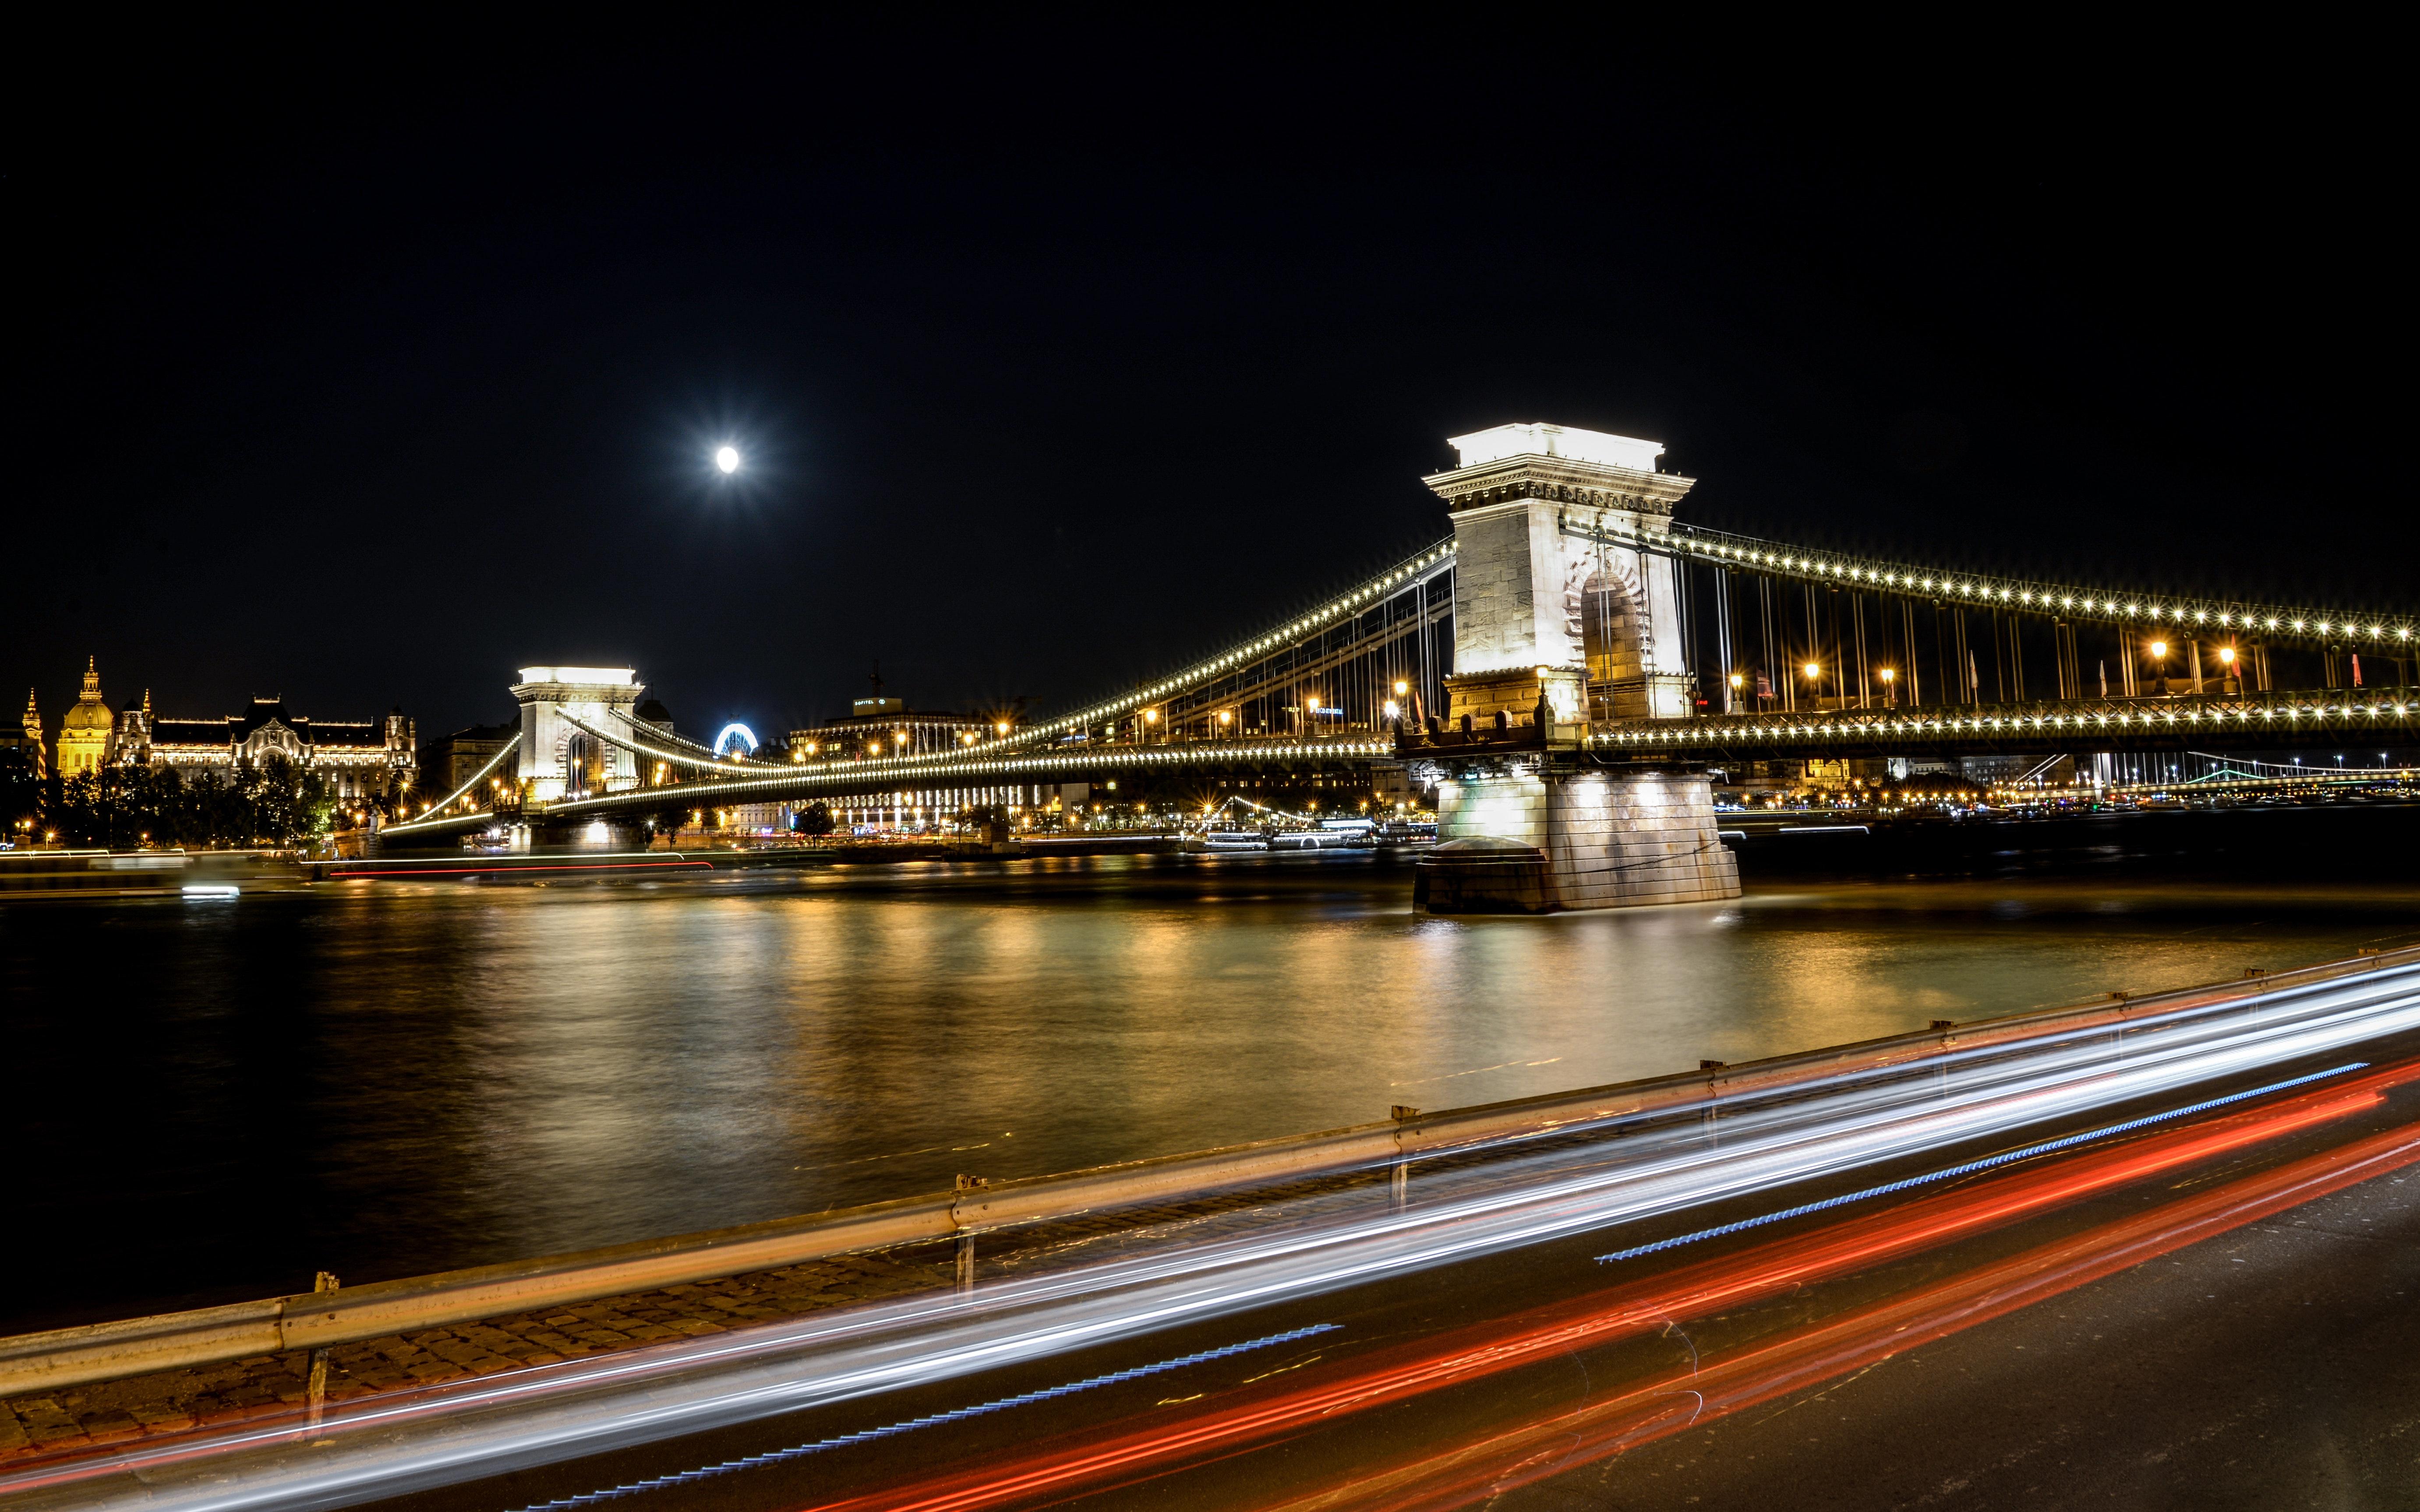 Tower bridge, london england photo